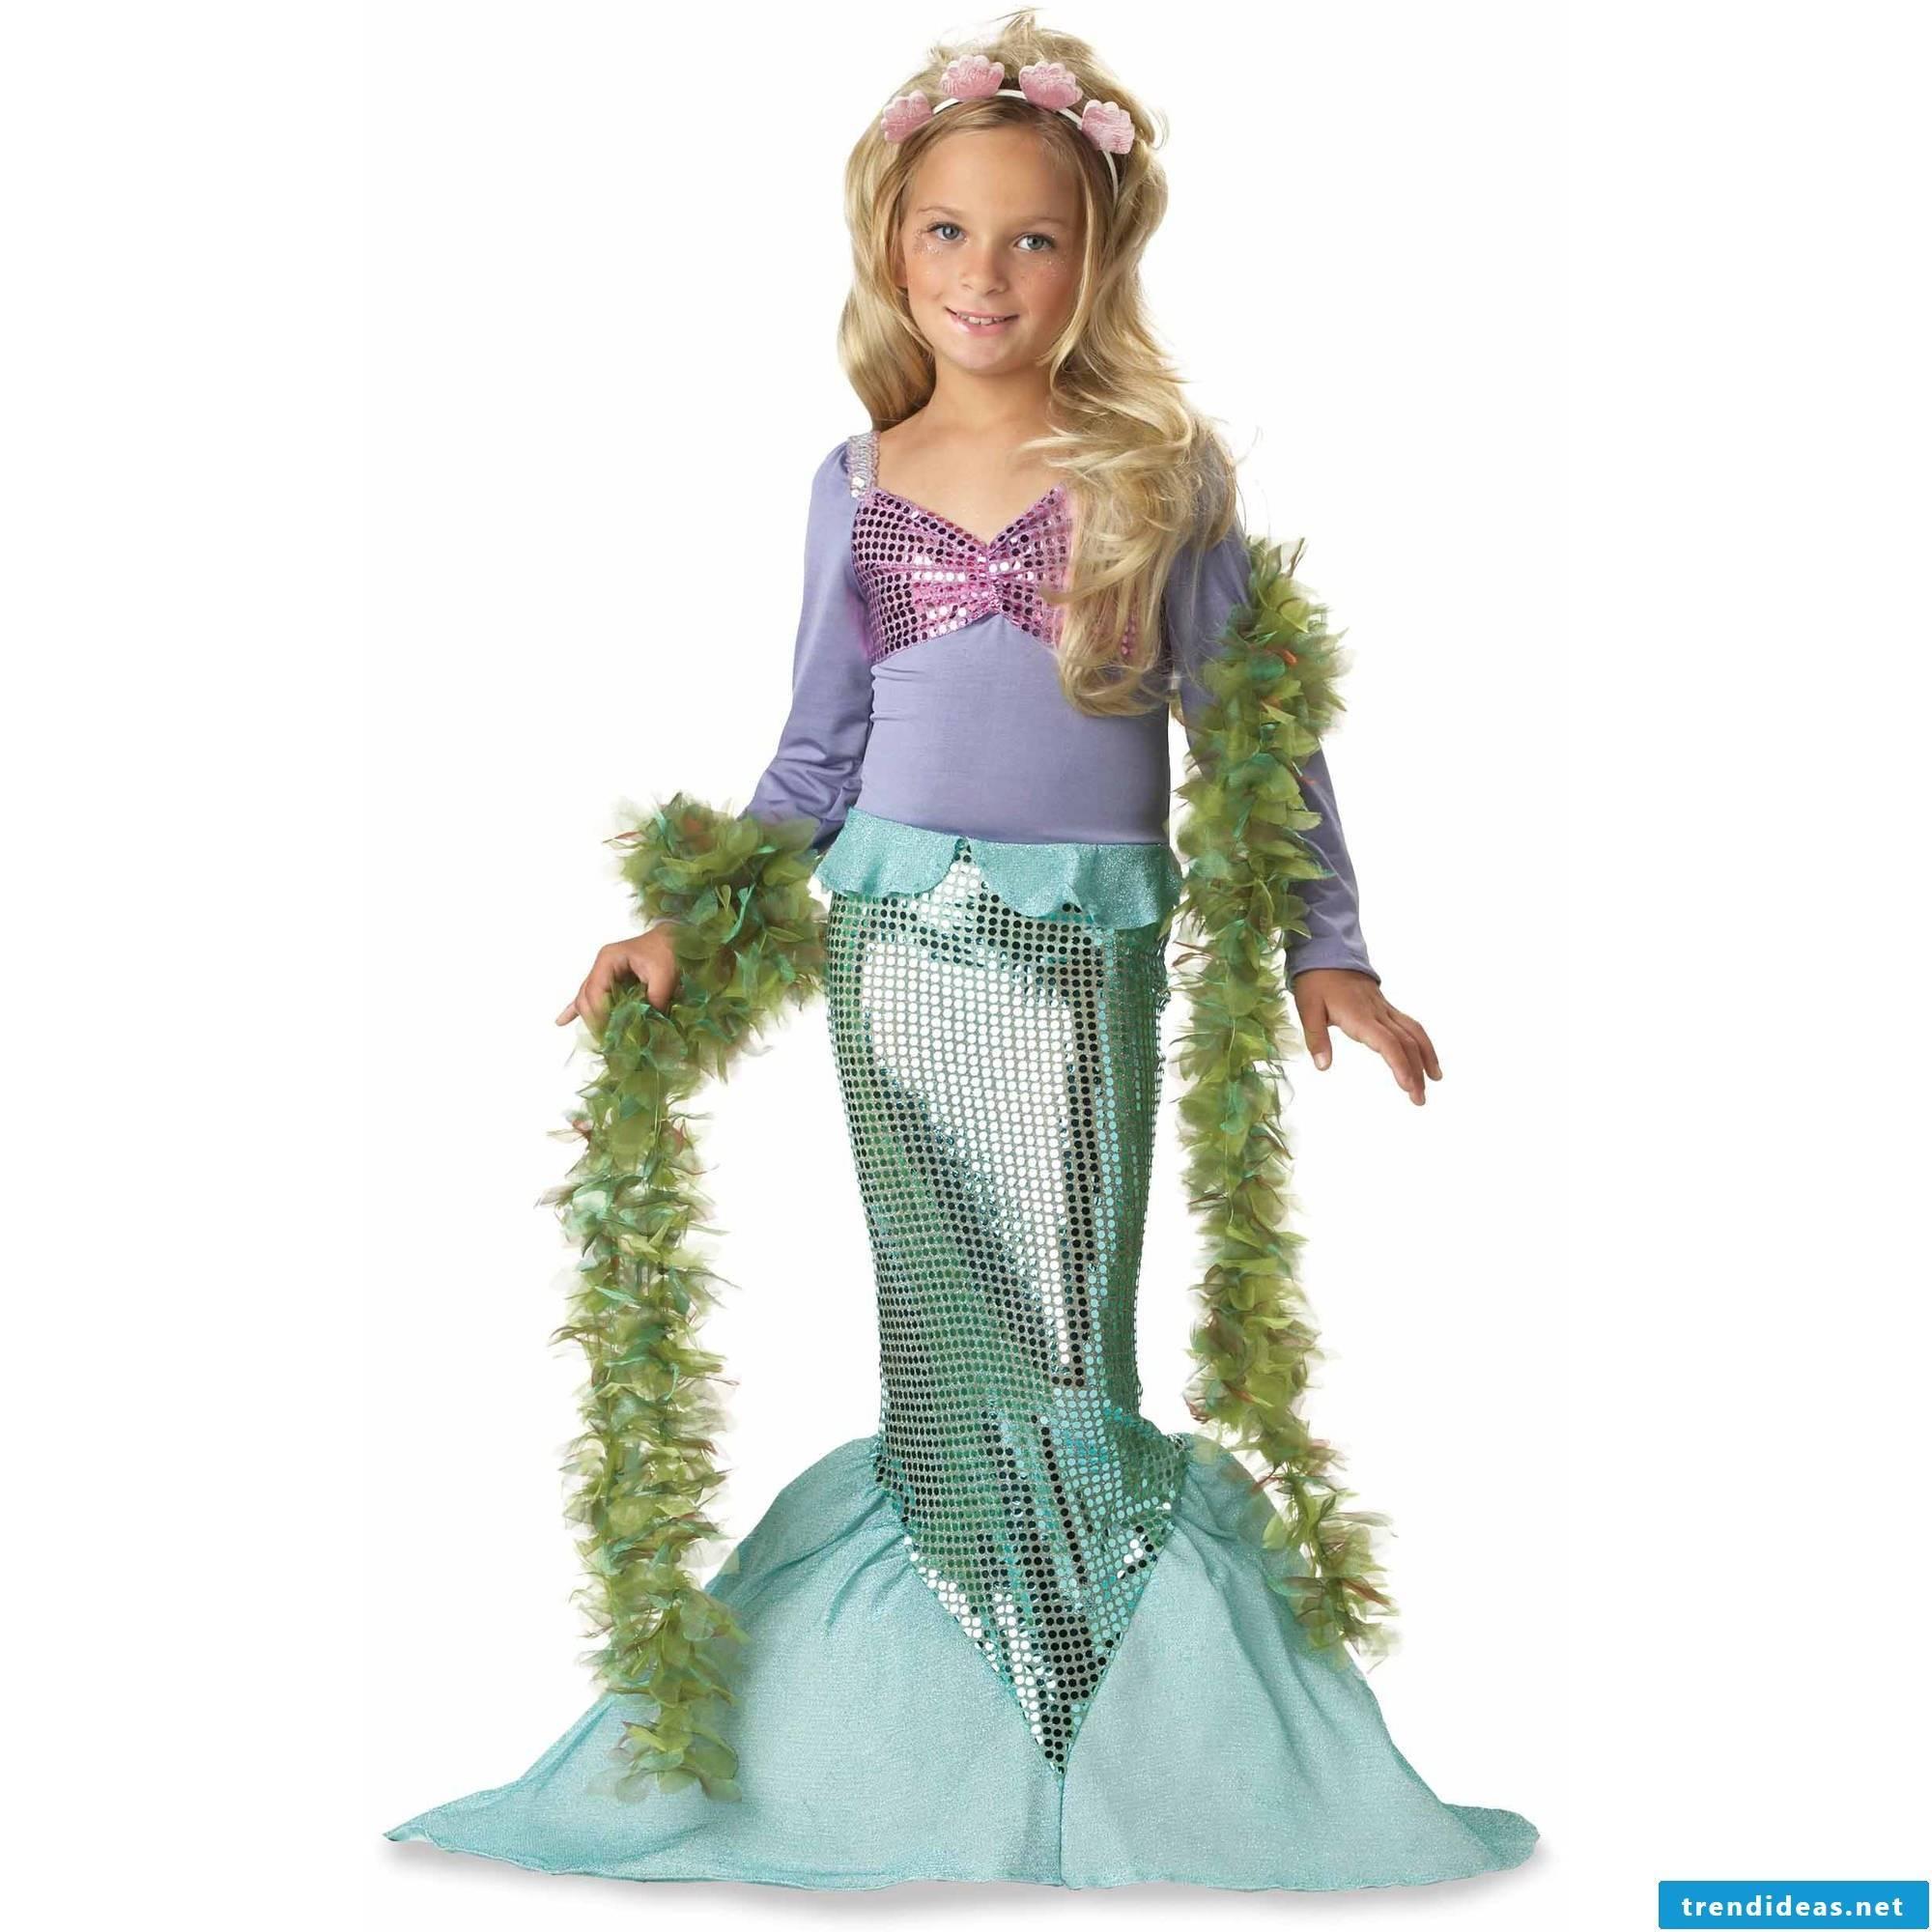 Arielle, the mermaid - a great Halloweeen costume kids